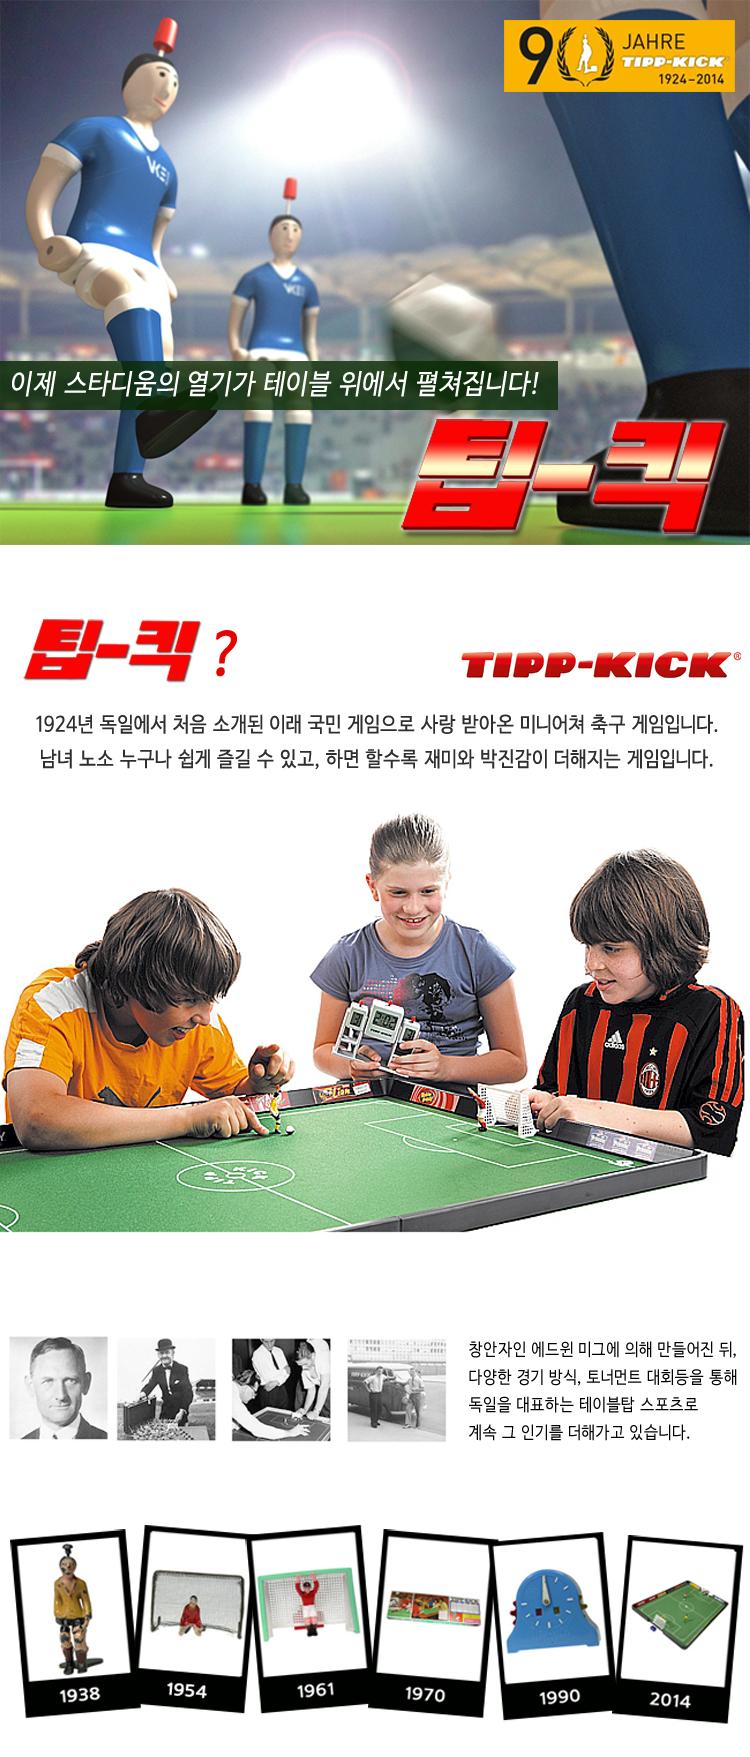 tipp kick ball